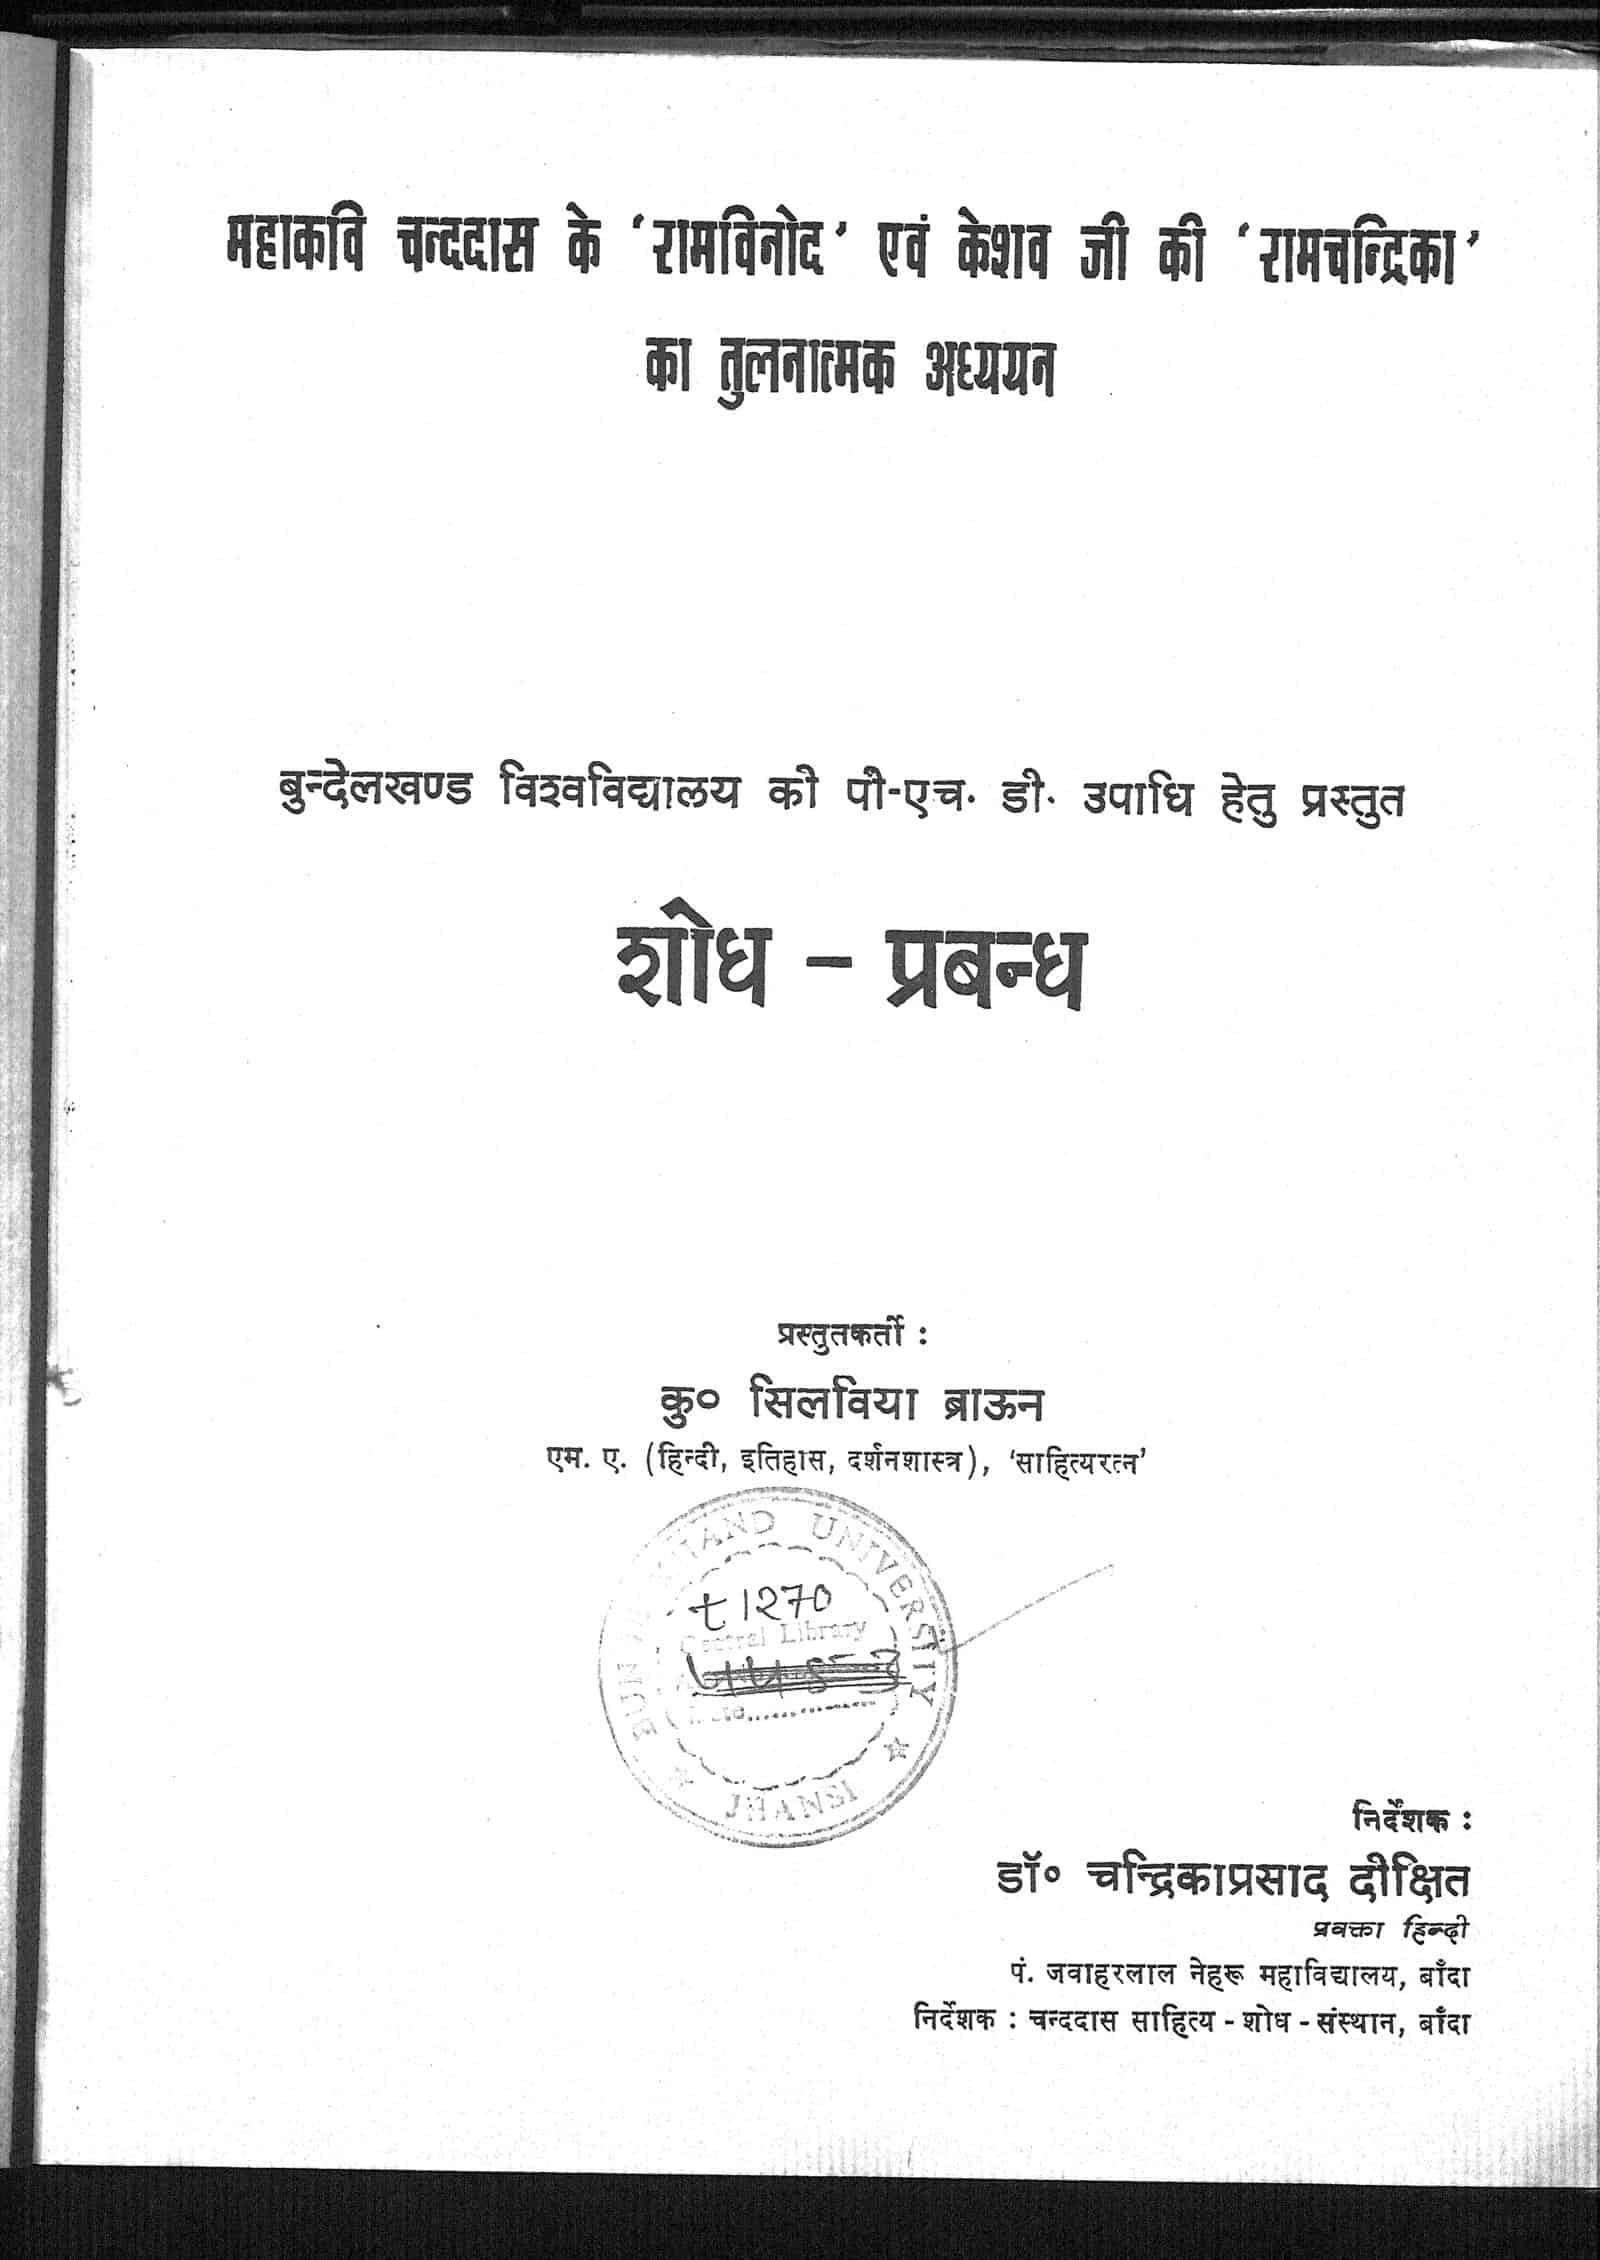 Book Image : महाकवि चन्ददास के रामविनोद एवं केशव जी की रामचन्द्रिका का तुलनात्मक अध्ययन - Mahakavi Chandadas K Ramavinod Avam Keshav Ji Ki Ramachandrika Ka Tulanatmak Adhyayan